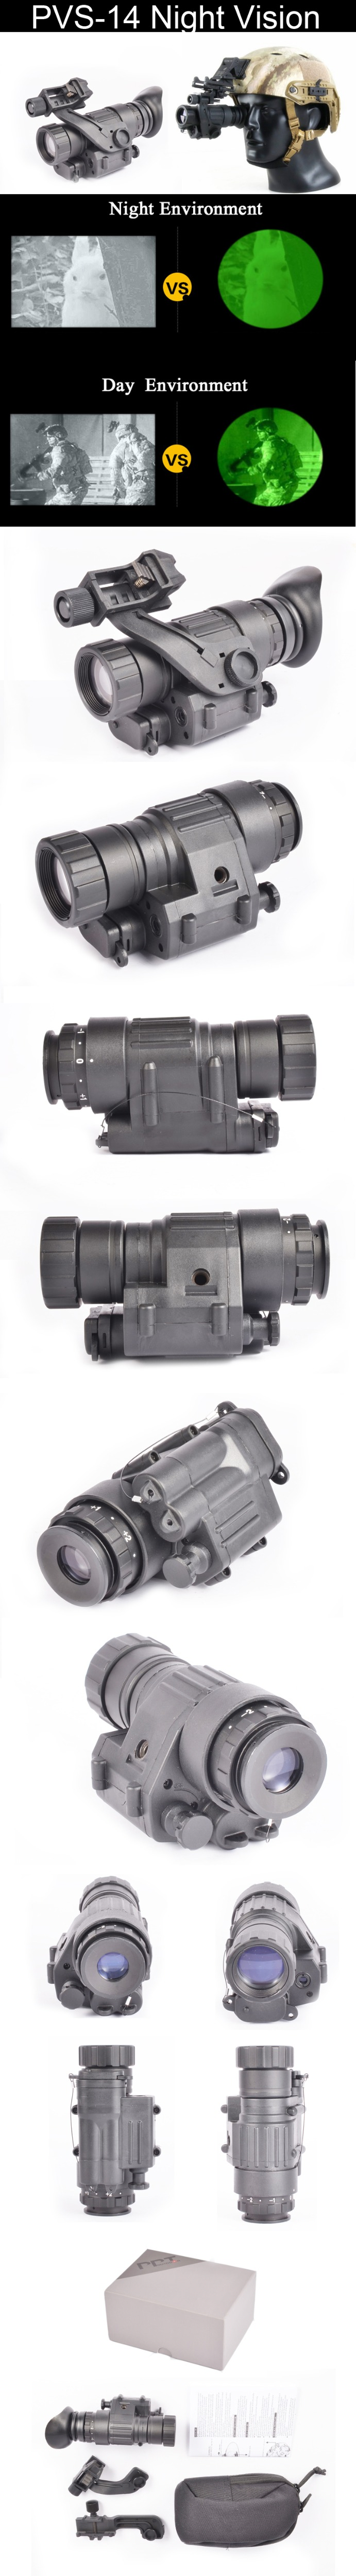 PVS-14